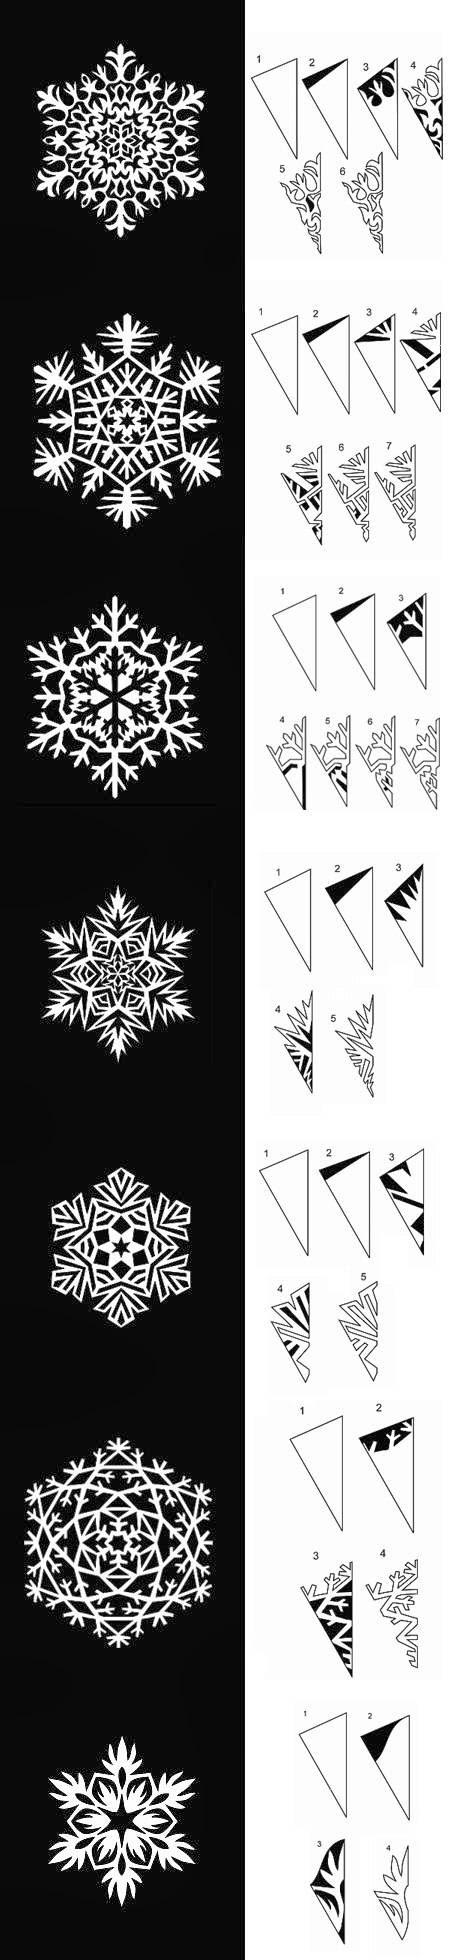 brainstorm snowflakes